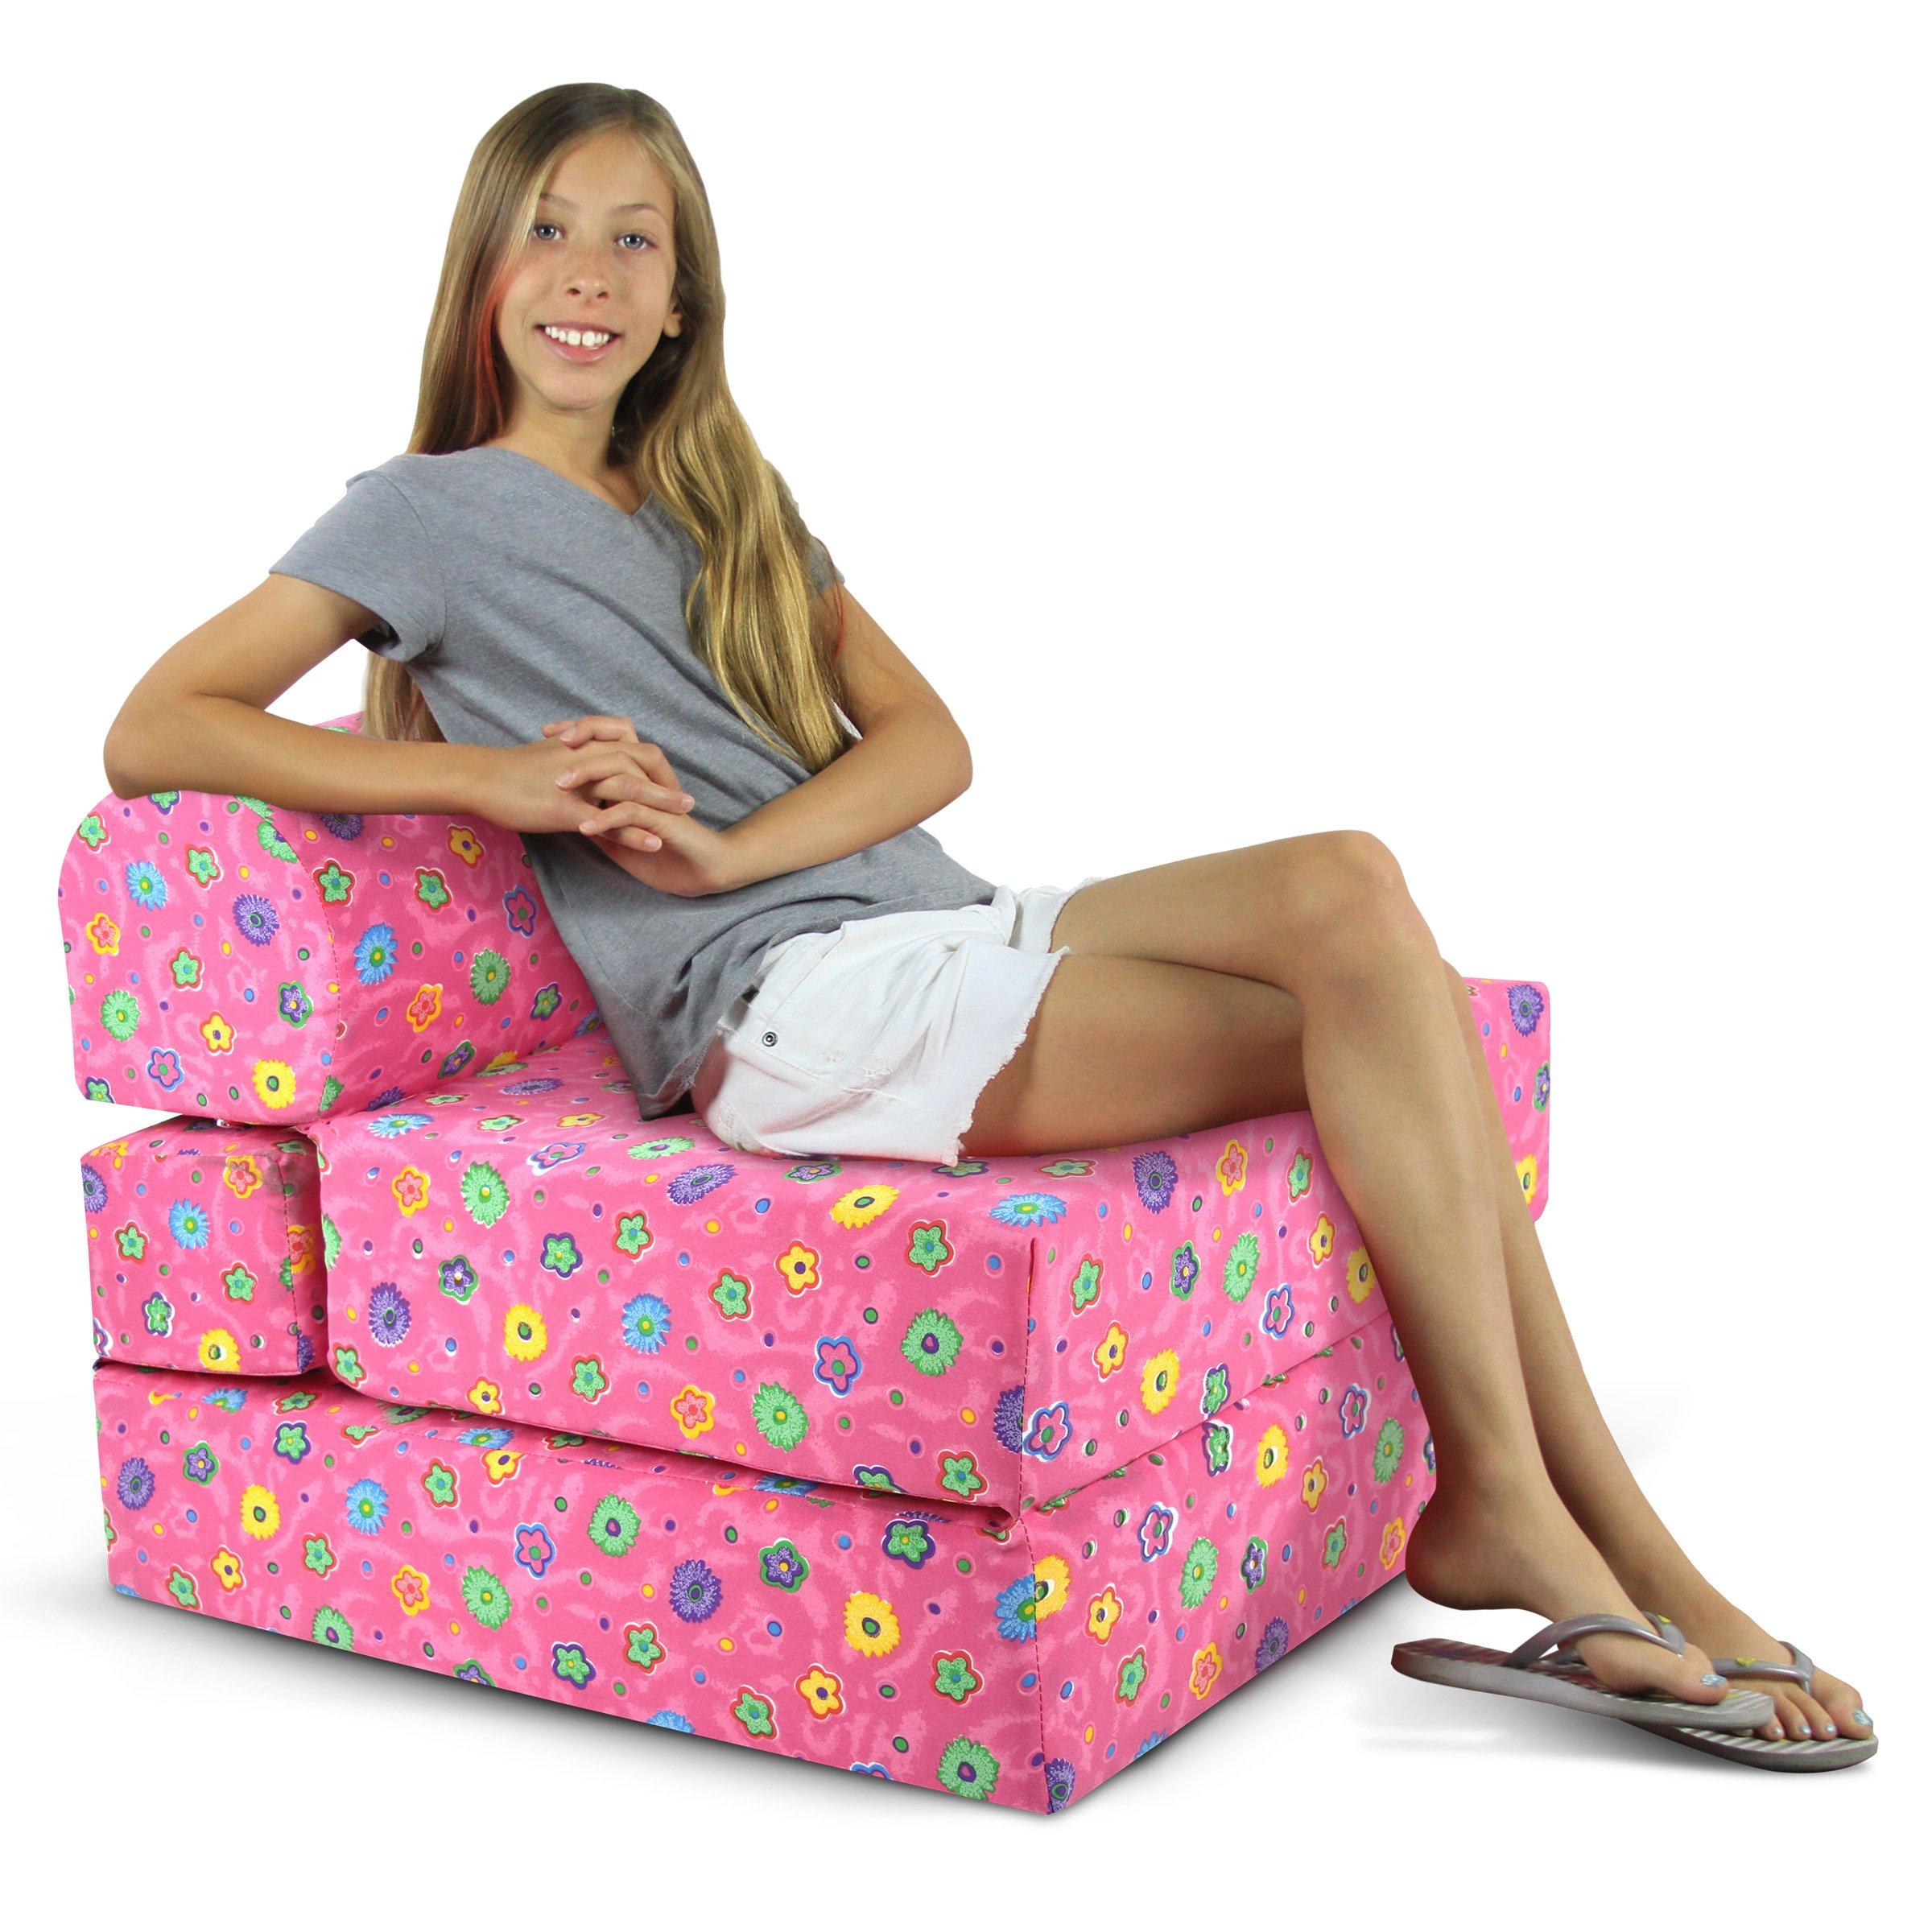 Children's Studio Chair Sleeper  Jr. Twin 24'', Pink Flower